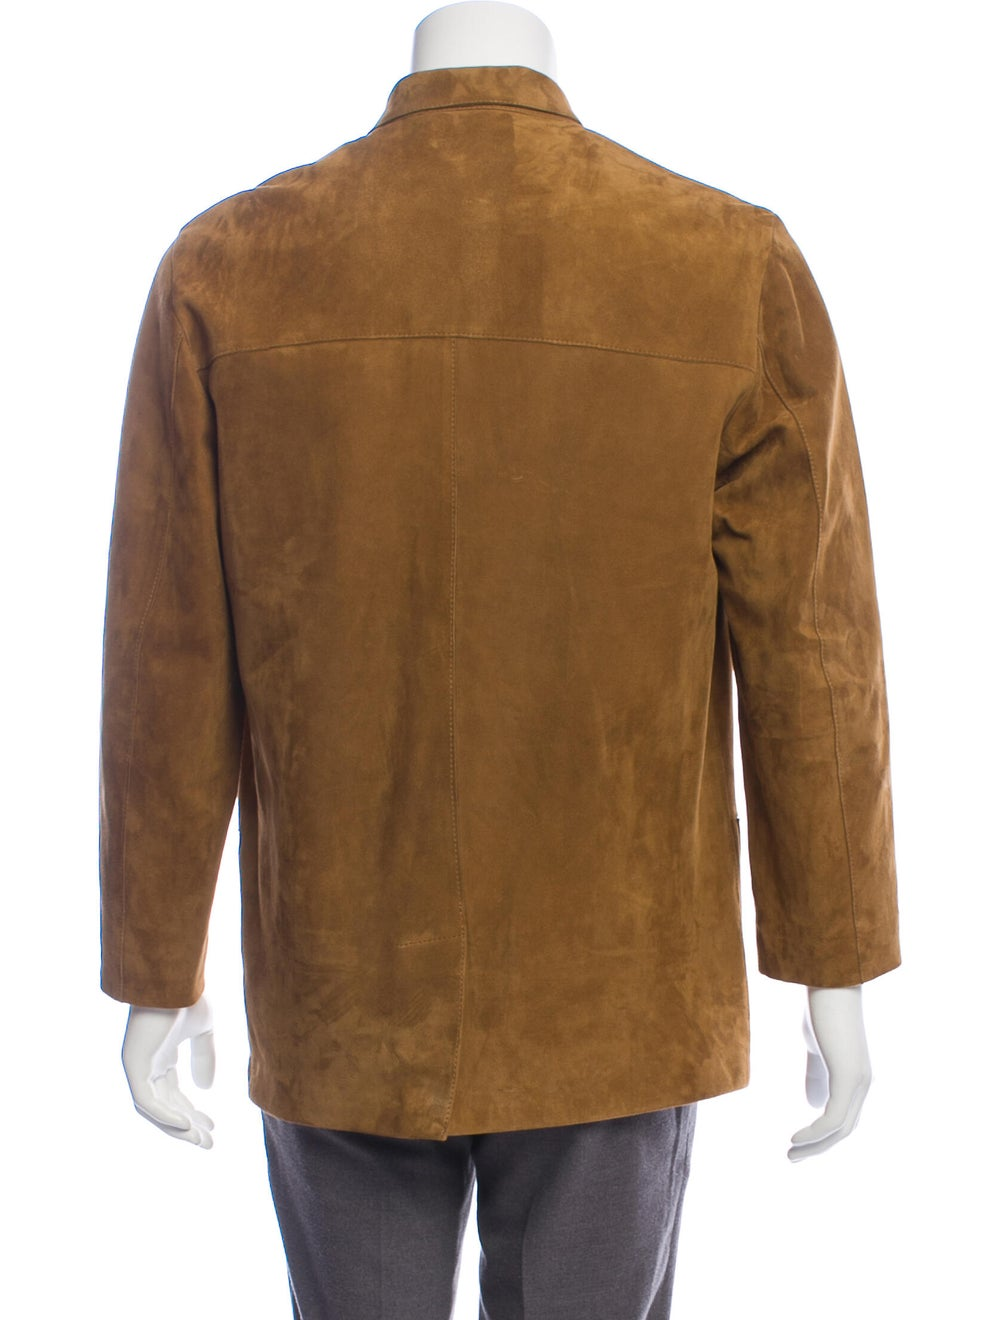 Bijan Suede Shirt Jacket - image 3